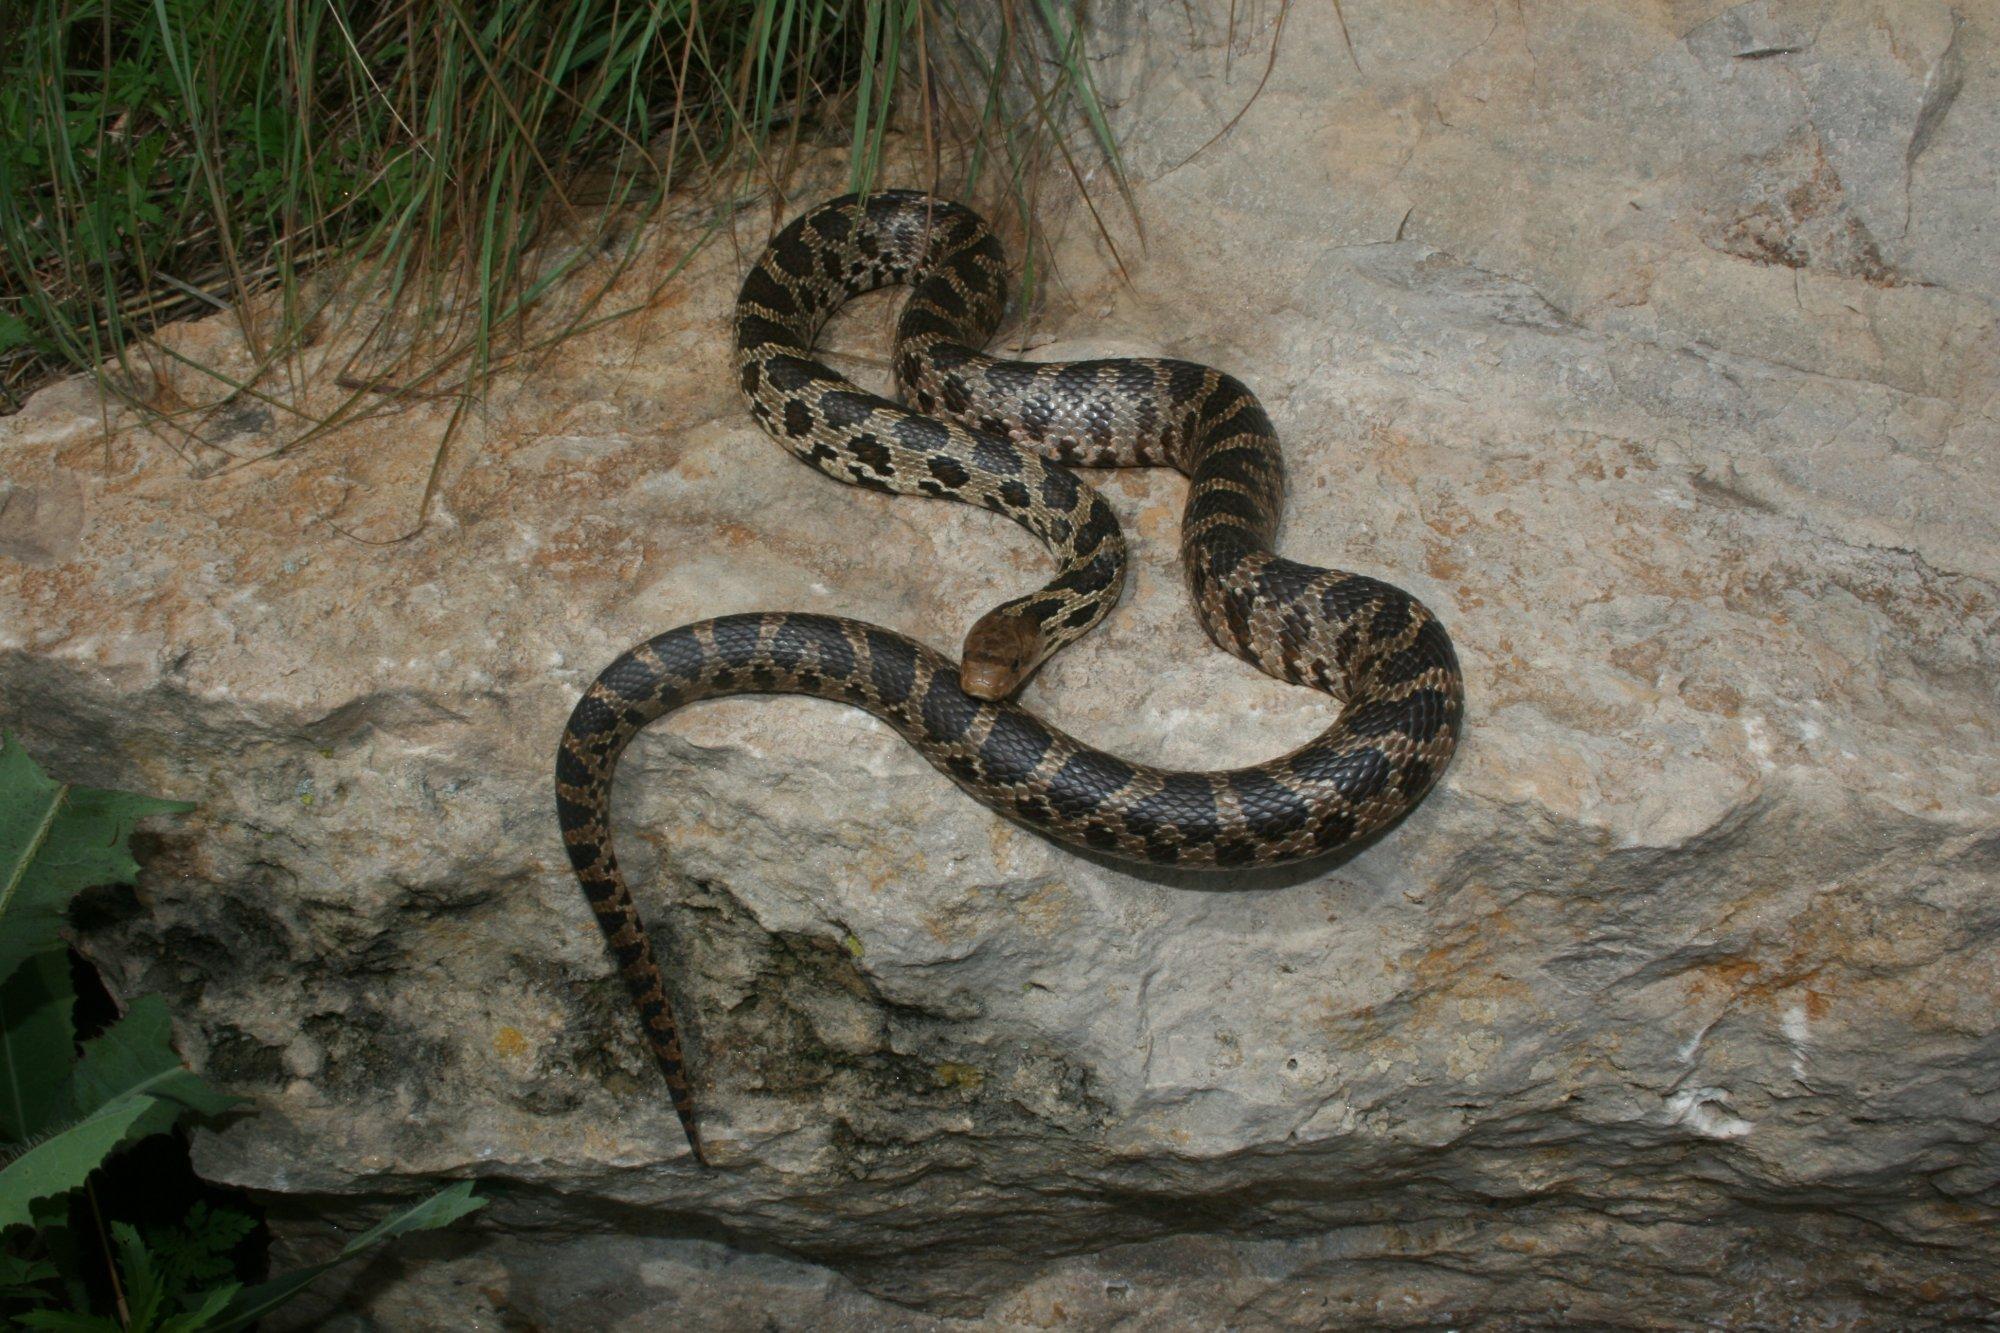 Western Fox Snake Pantherophis Vulpinus Reptiles And